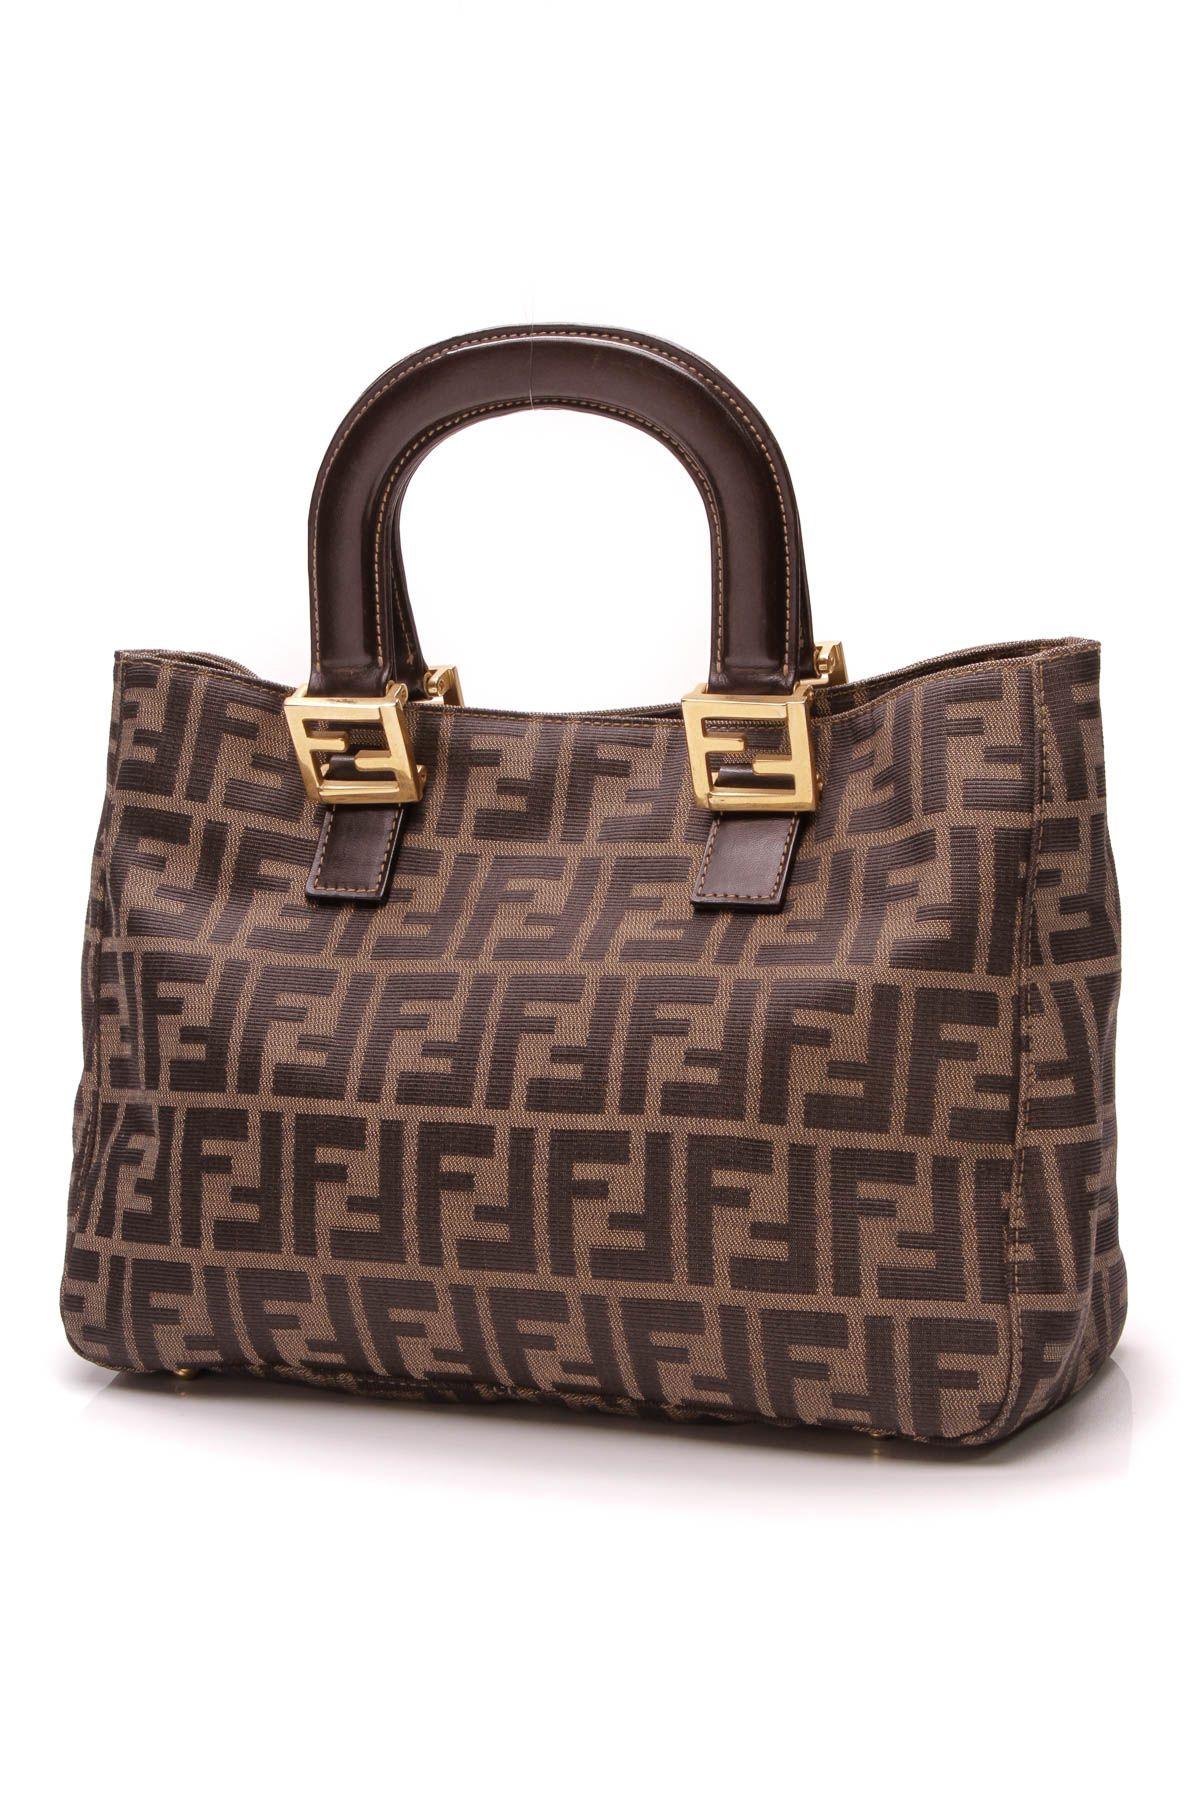 a734e5ba30f1 Fendi Zucca Vintage Tote Bag - Brown